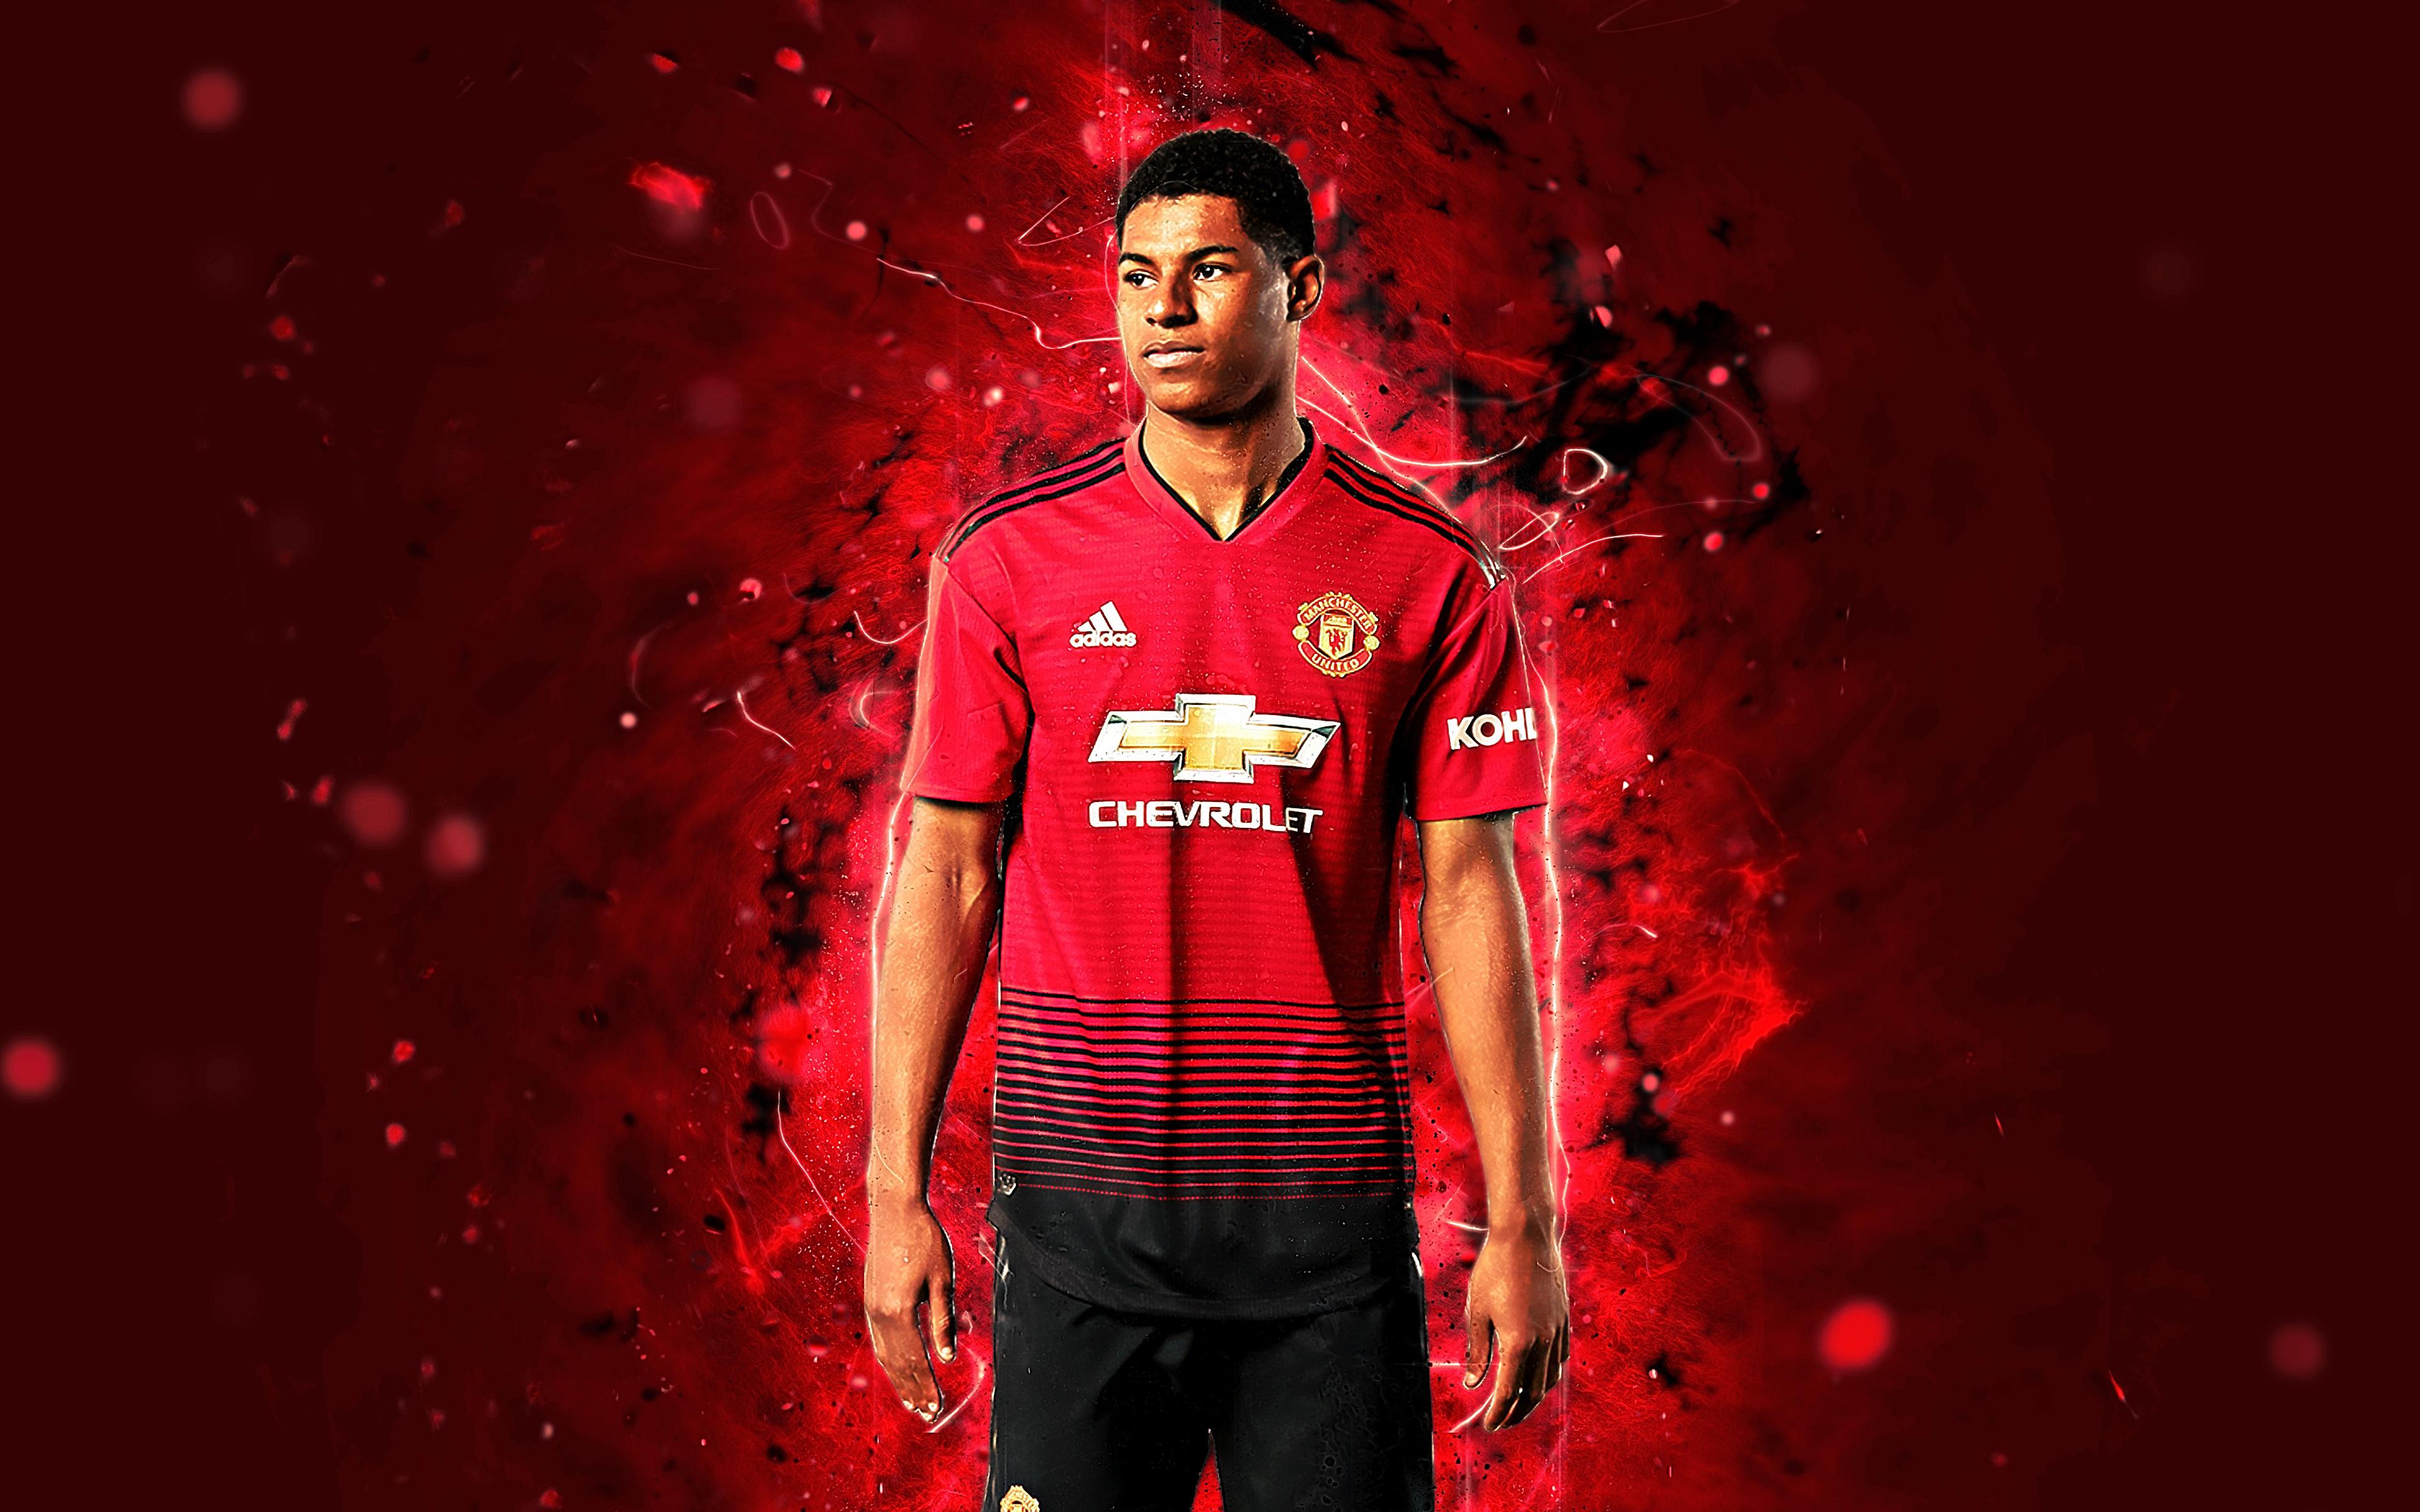 Manchester United 4k Ultra HD Wallpaper